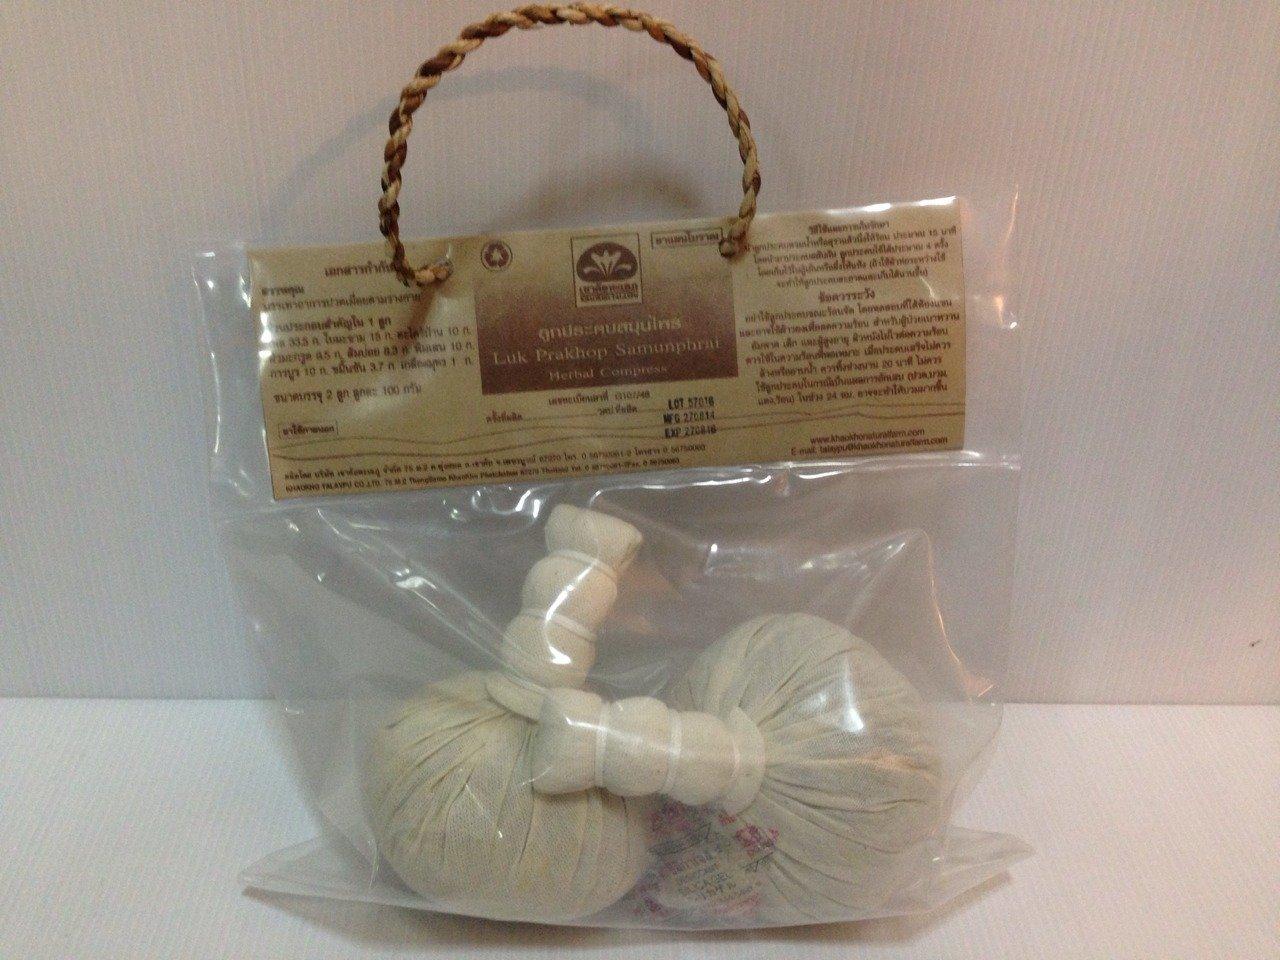 Amazing 2x Thai Herbal Compress Massage Pack Spa, Herbal Ball Thailan